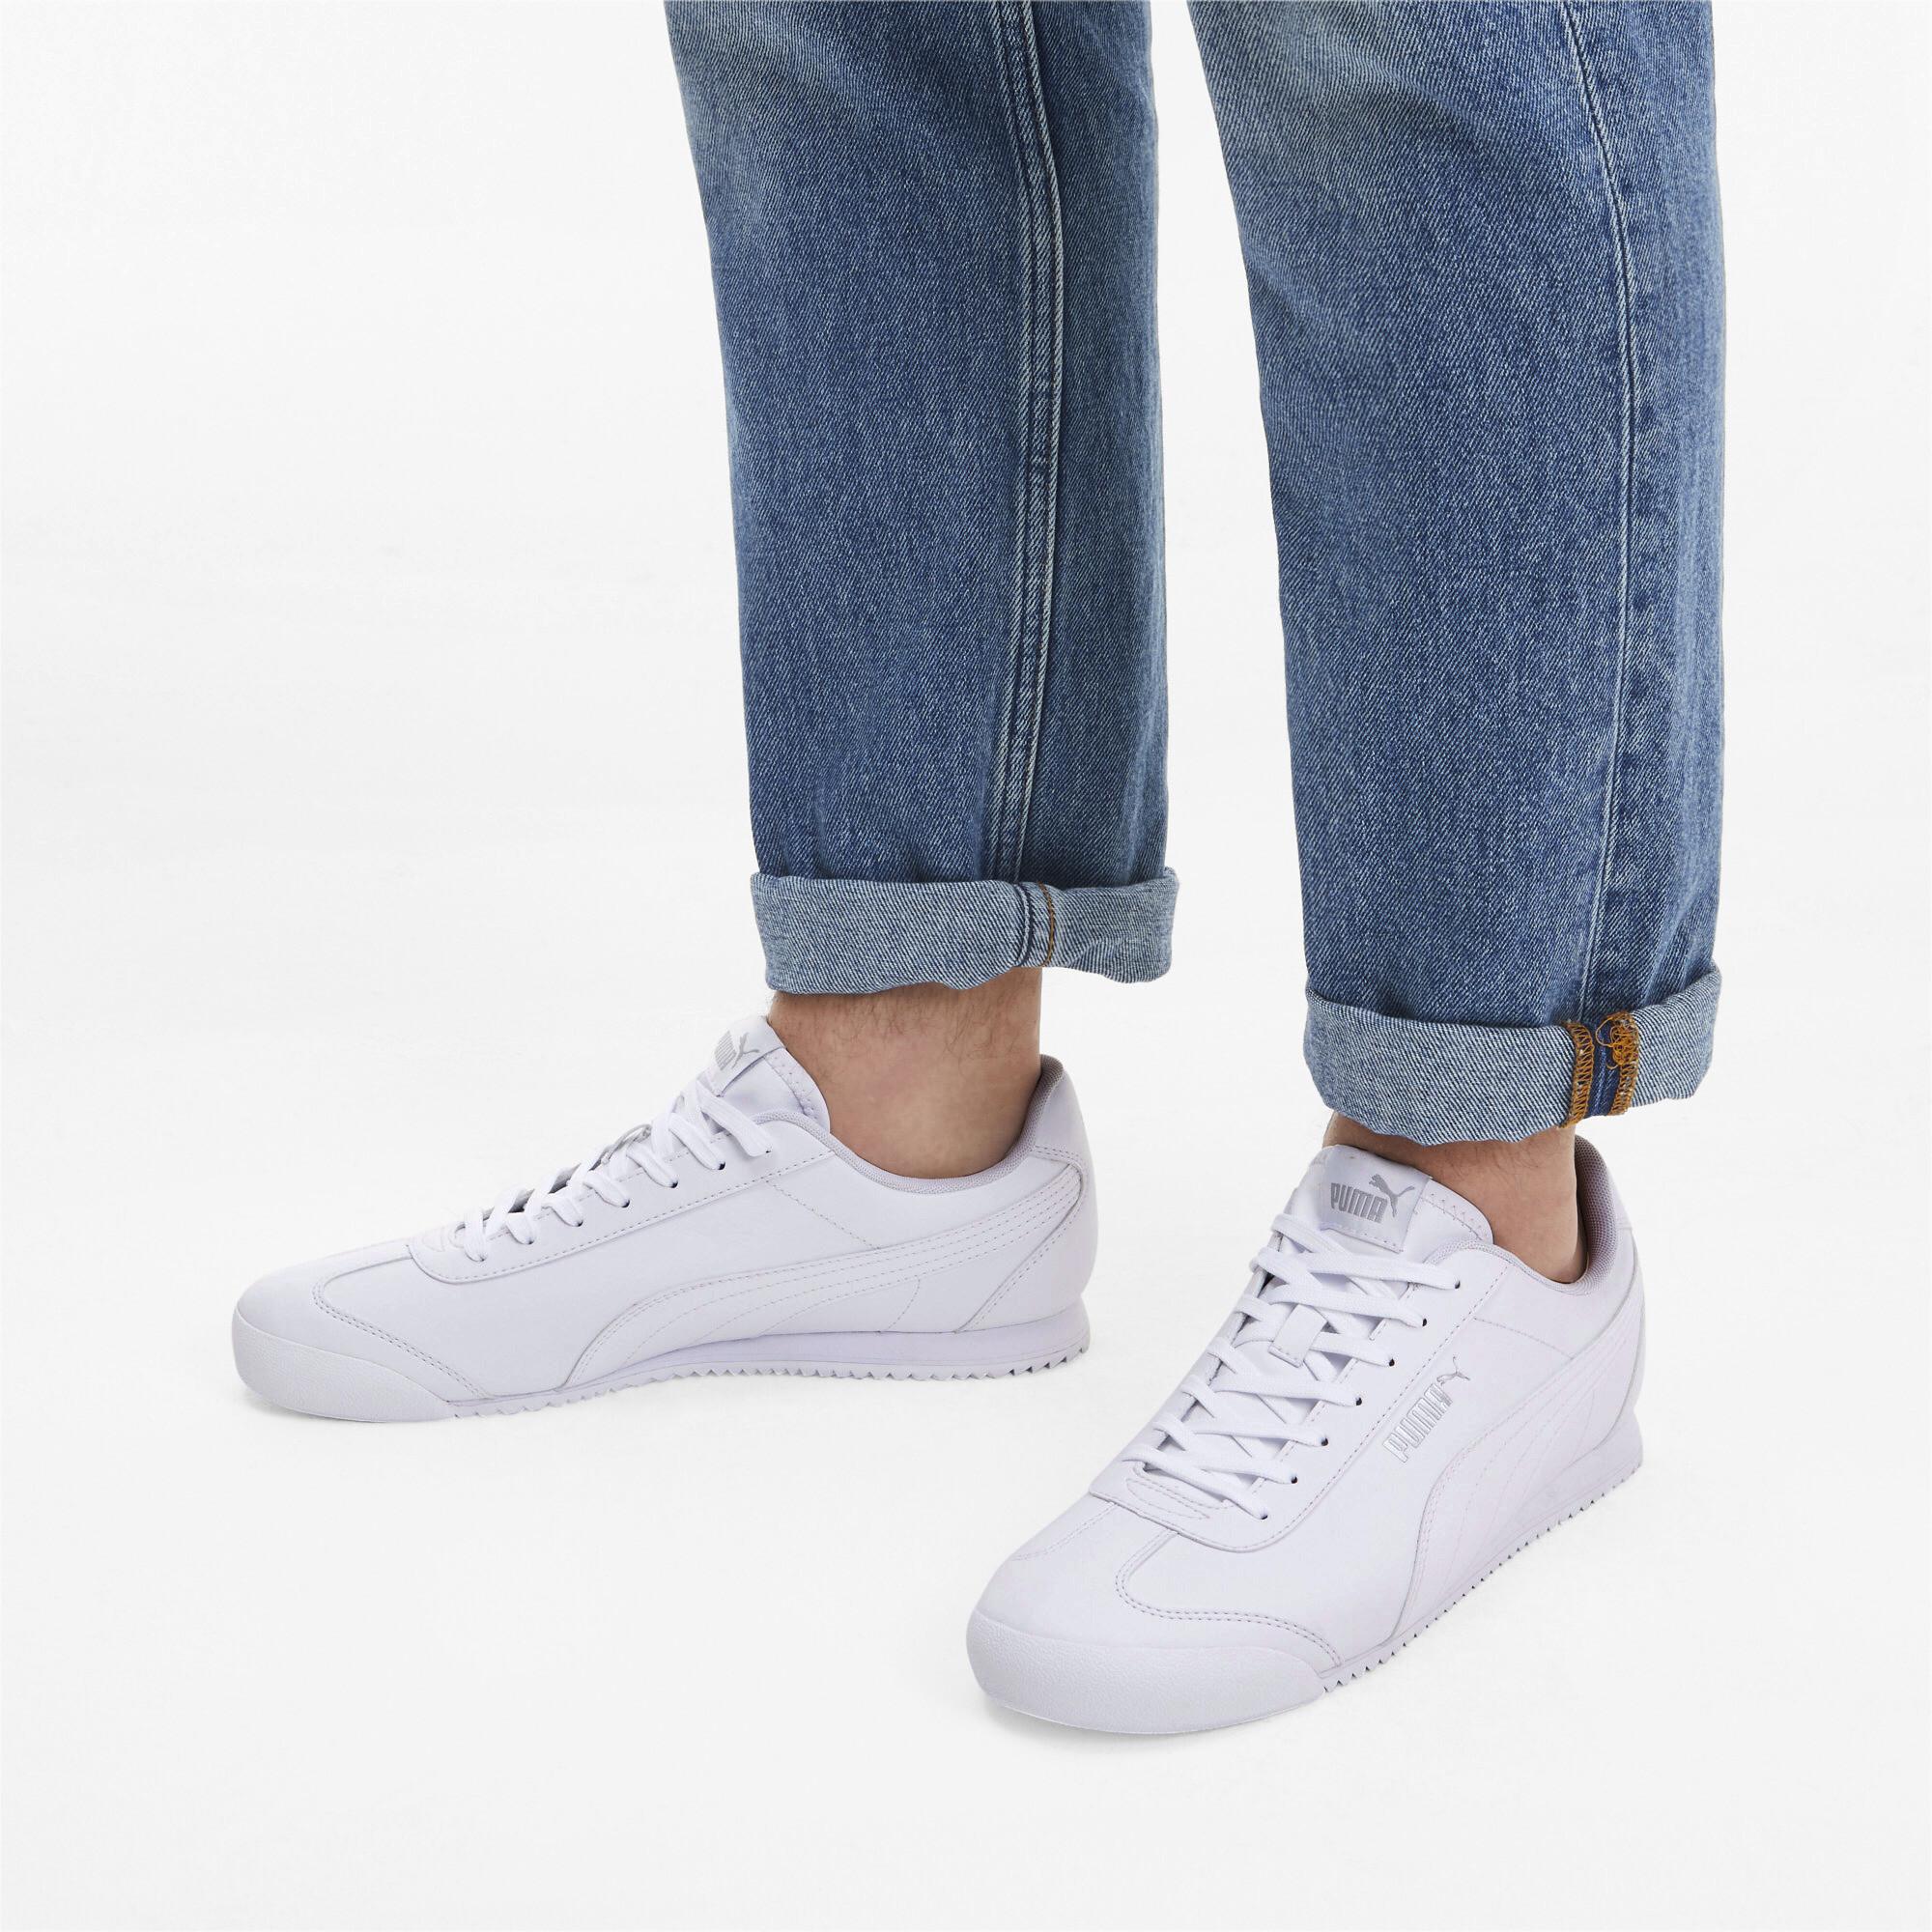 PUMA-Men-039-s-Turino-SL-Sneakers thumbnail 5